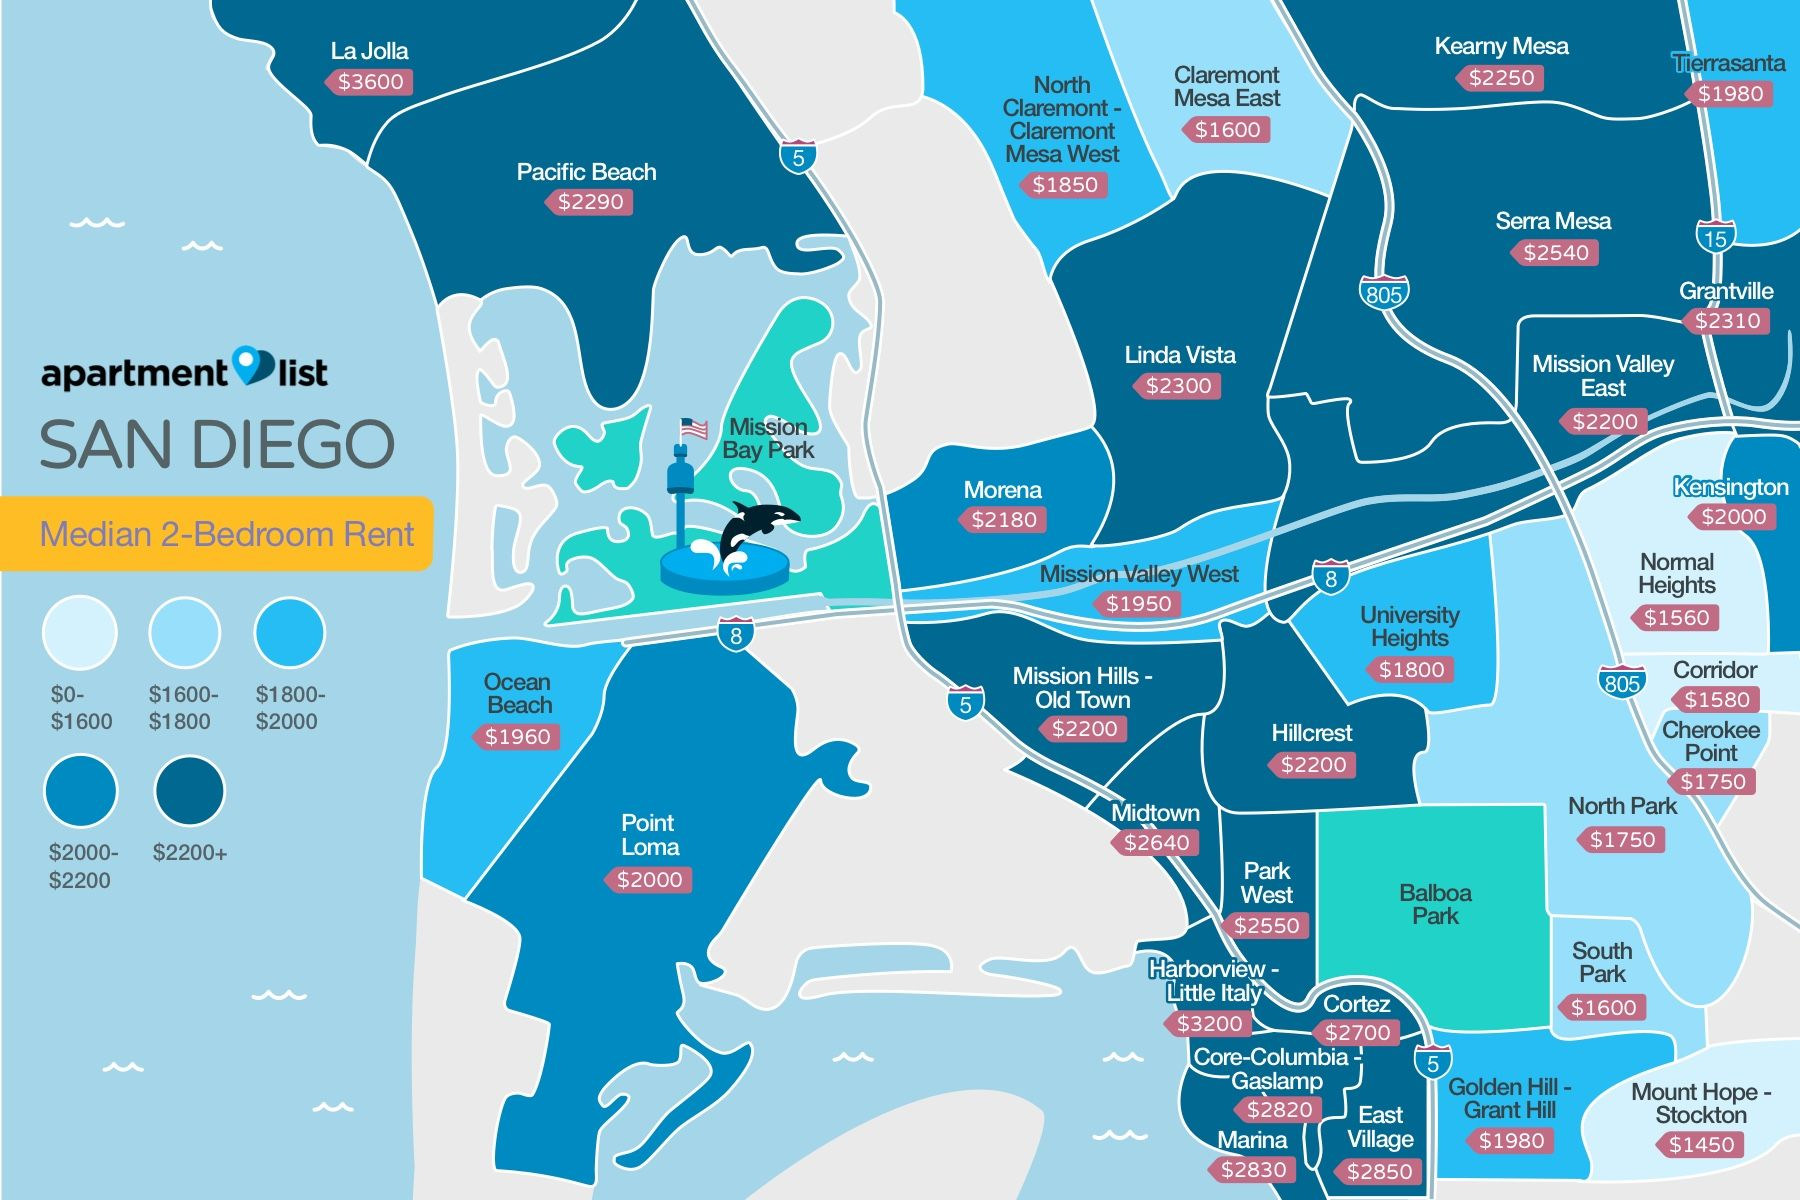 printable san diego neighborhood map San Diego Neighborhood Price Map San Diego Neighborhoods San